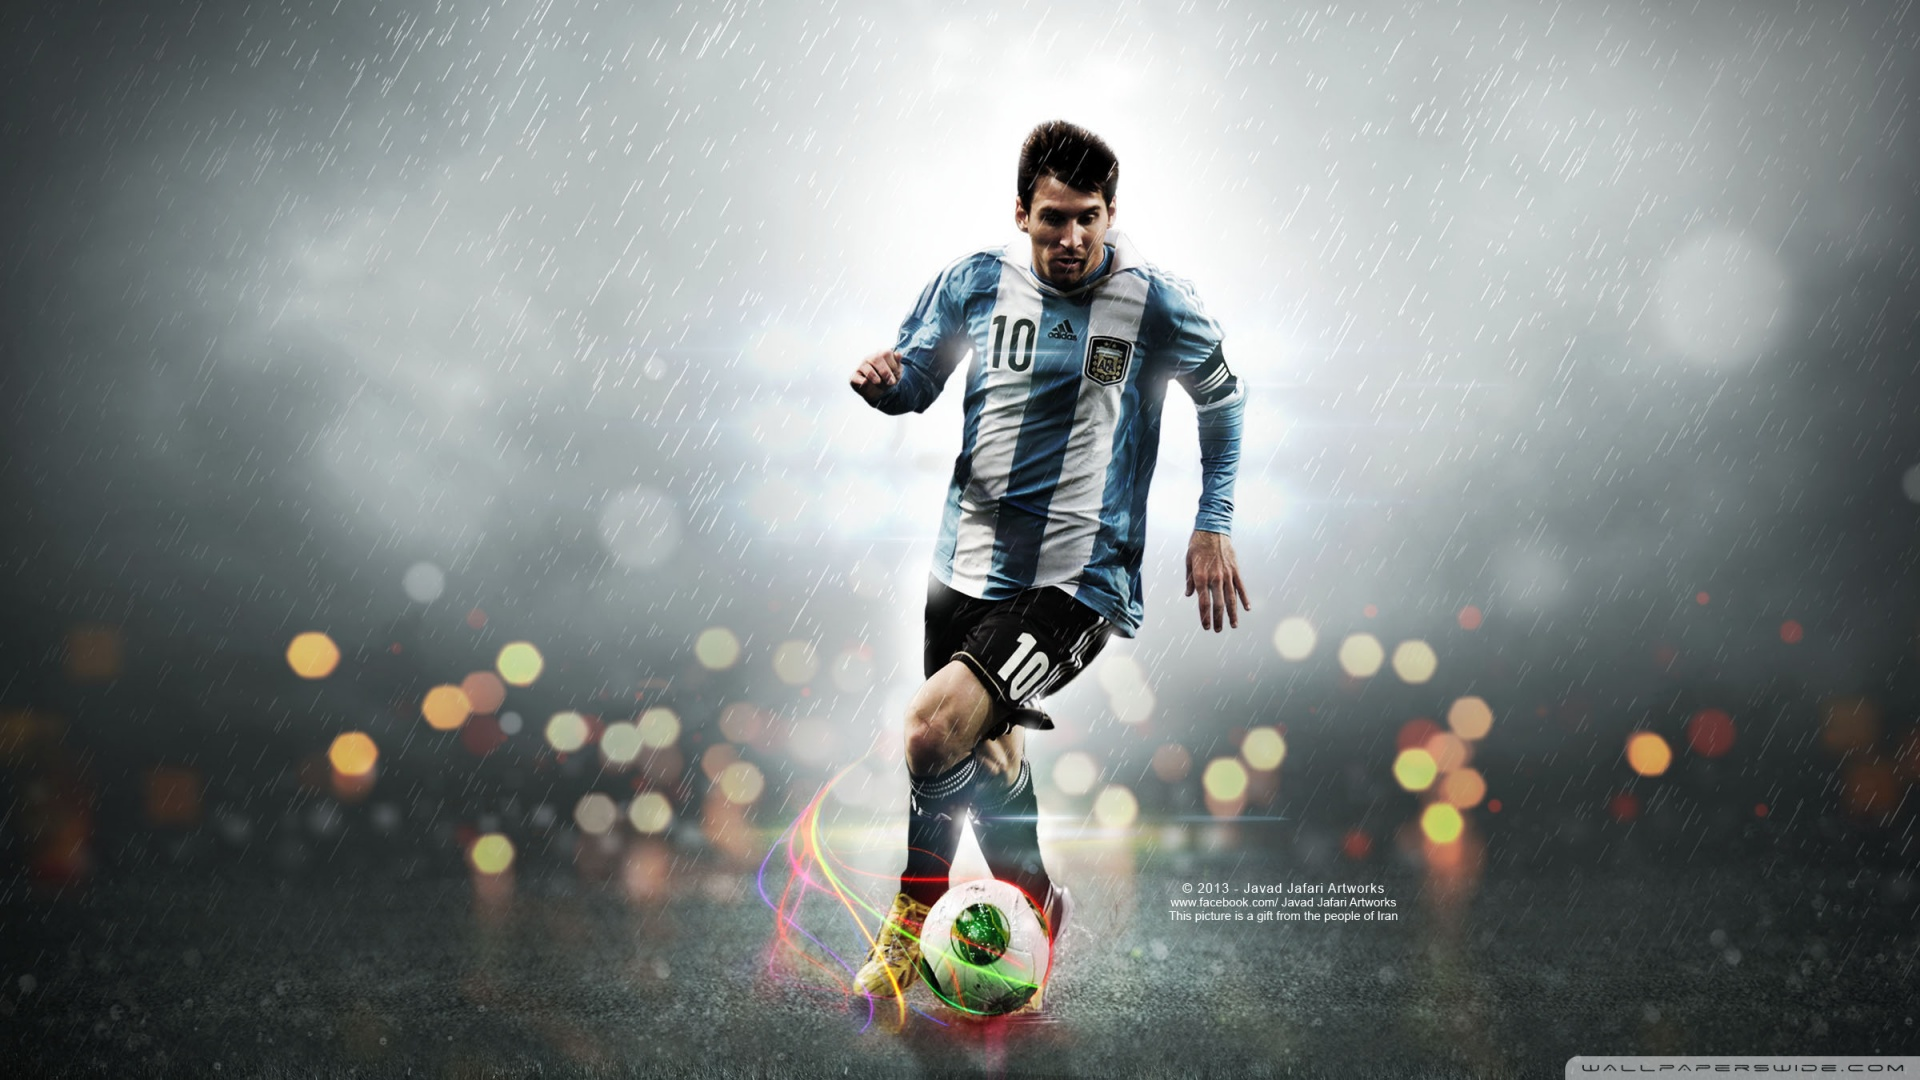 Messi Wallpaper 3 1920x1080